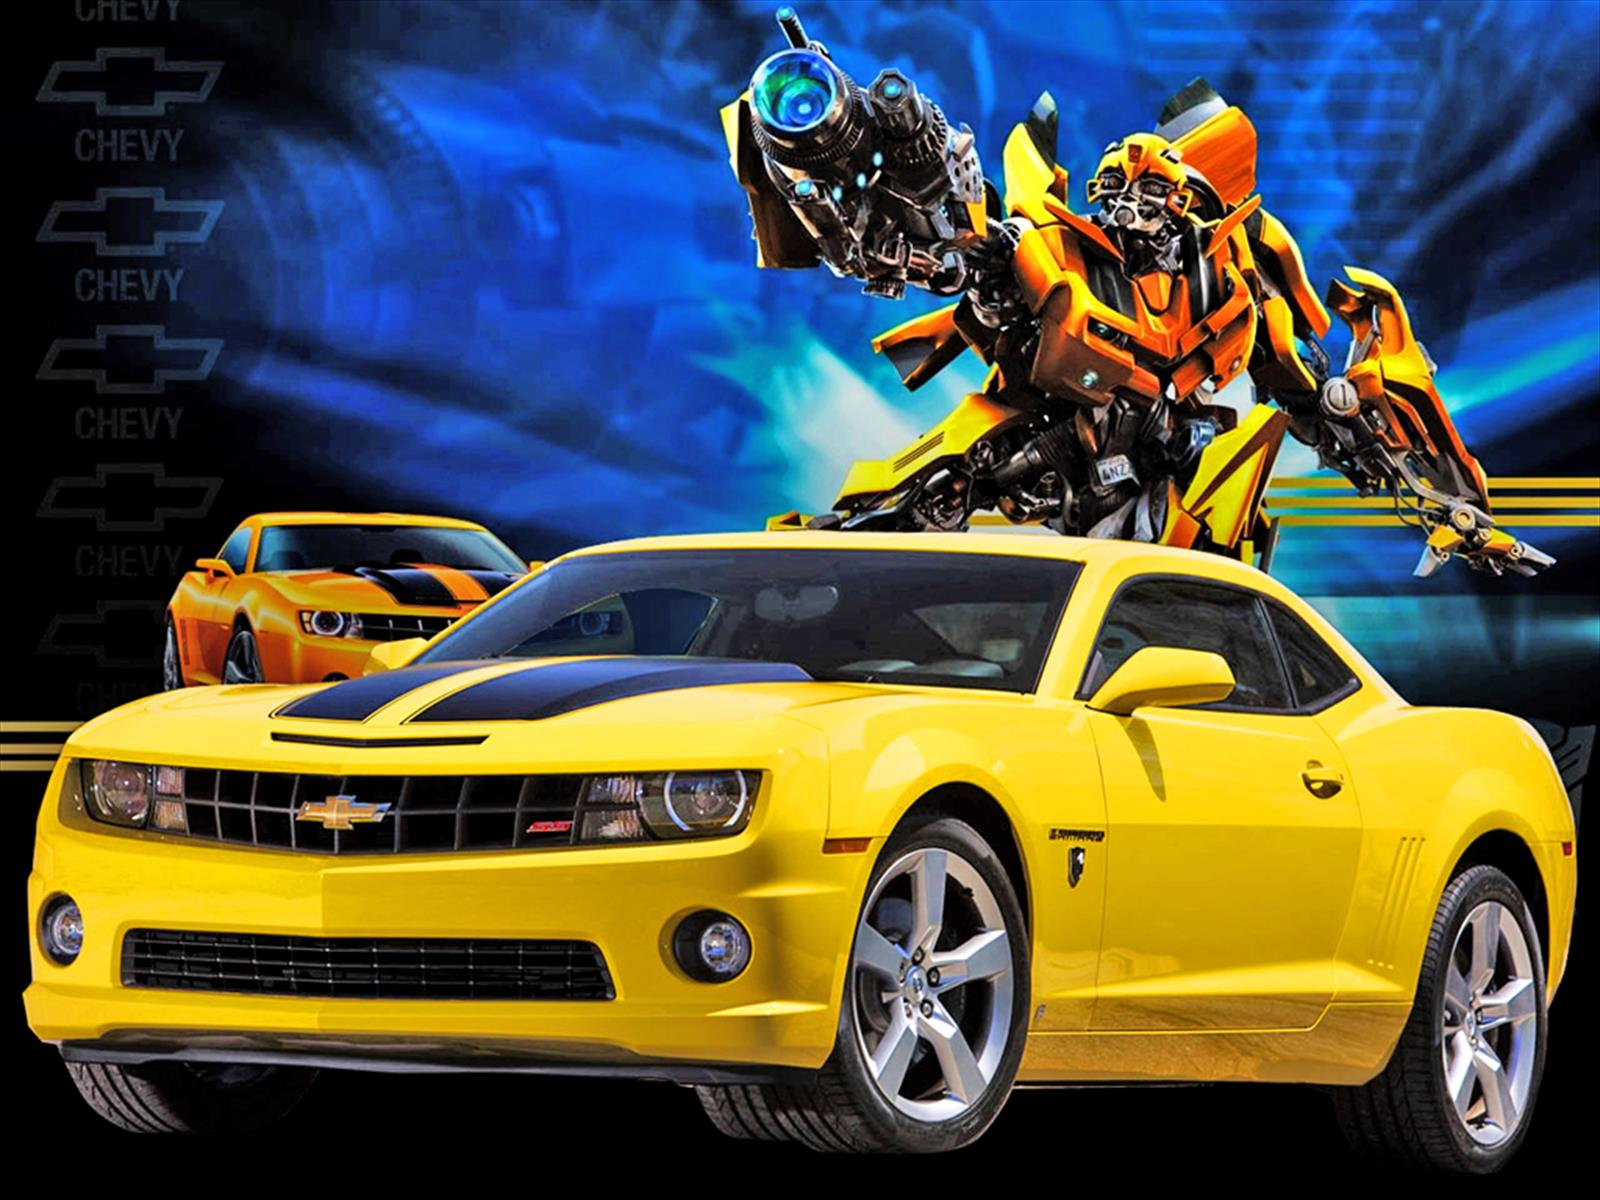 Transformers La Pel 237 Cula Que Hizo Del Camaro Una Estrella